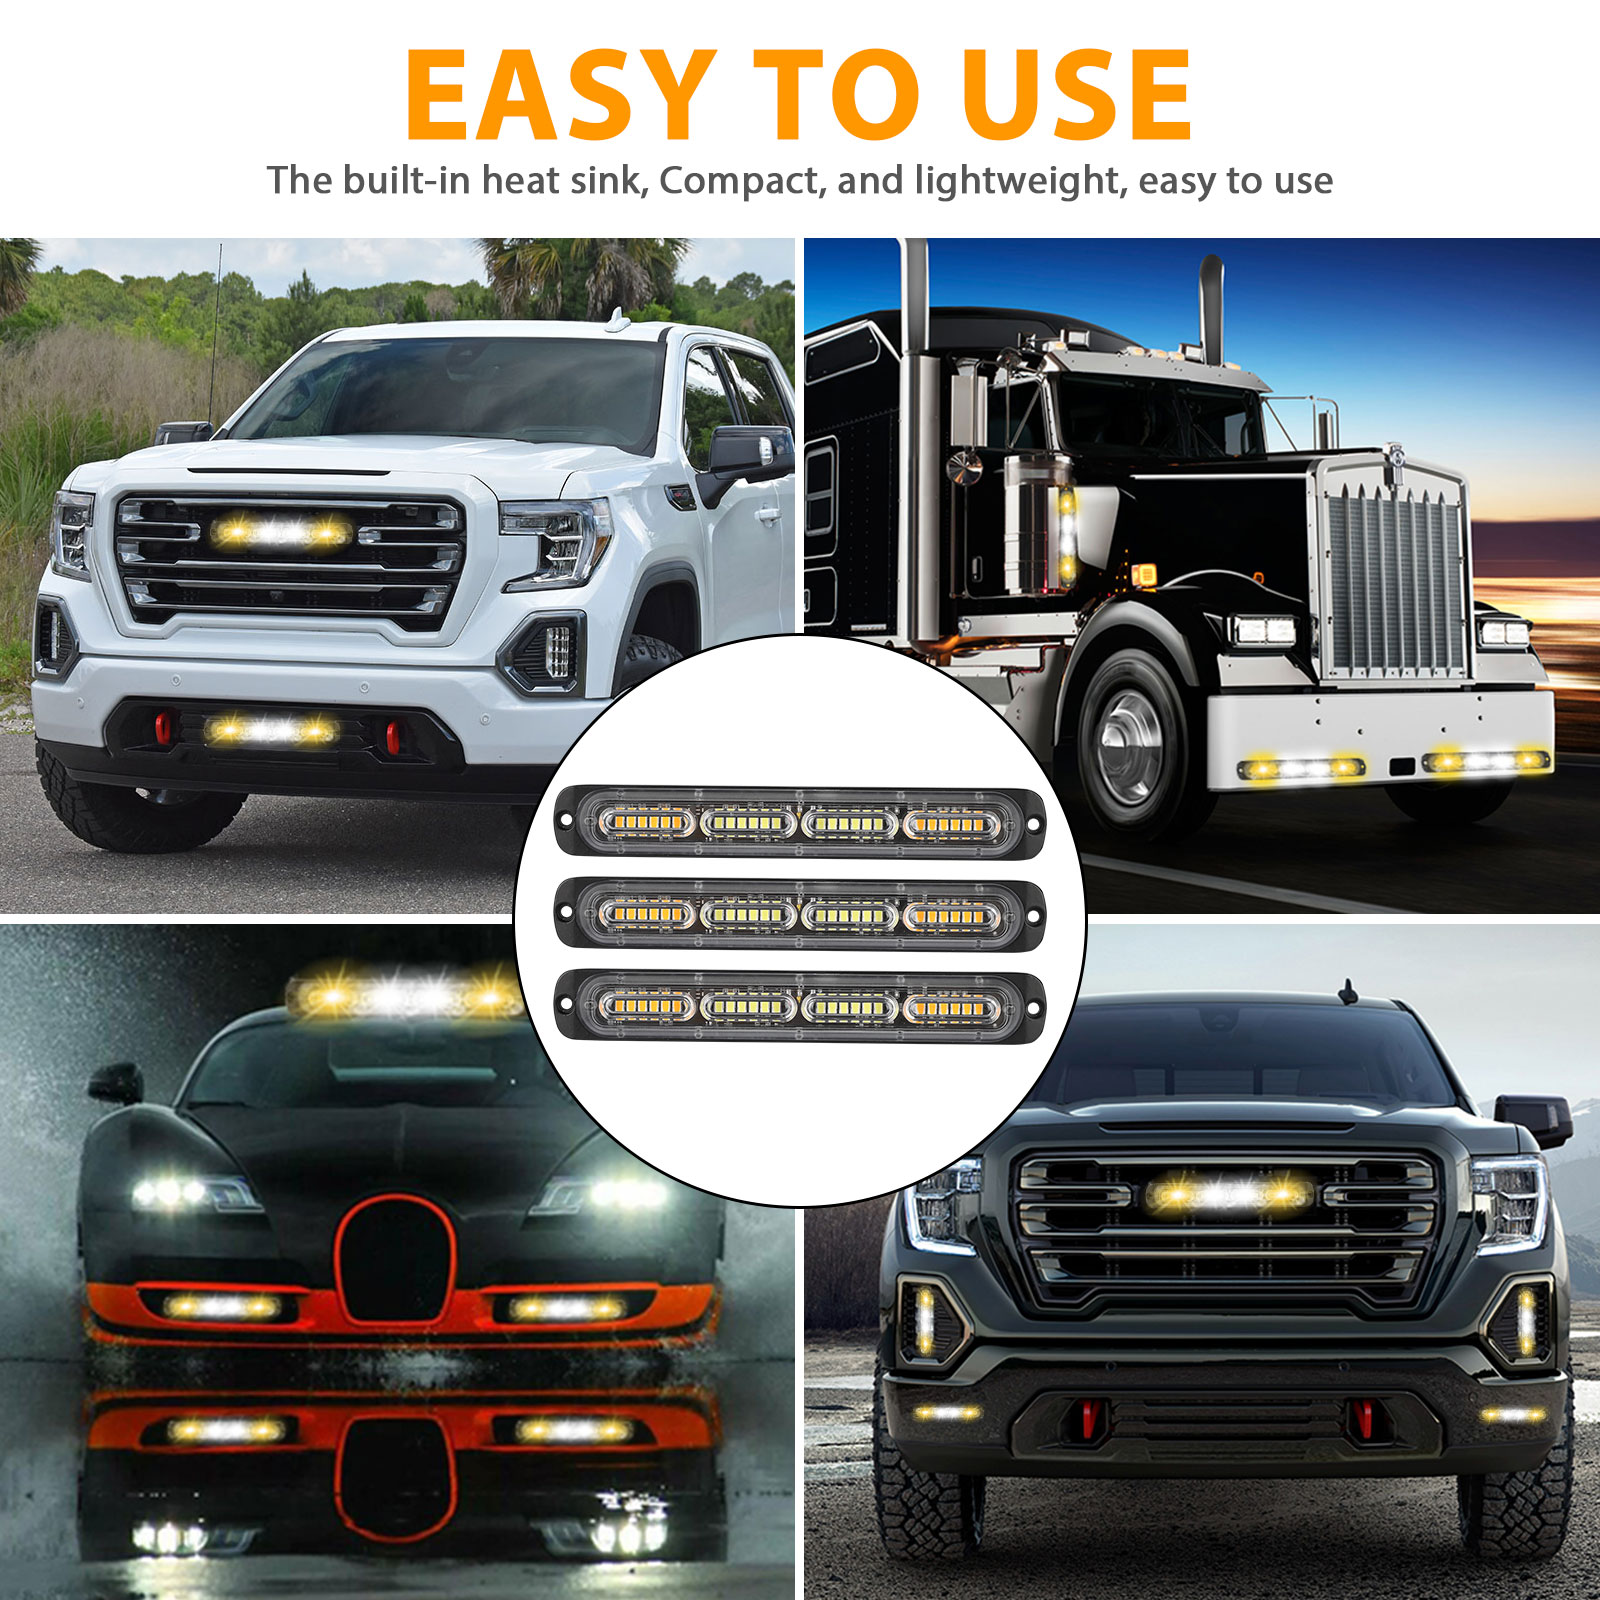 2PC-Amber-White-24LED-Car-Truck-Emergency-Warning-Hazard-Flash-Strobe-Light-Bar thumbnail 6